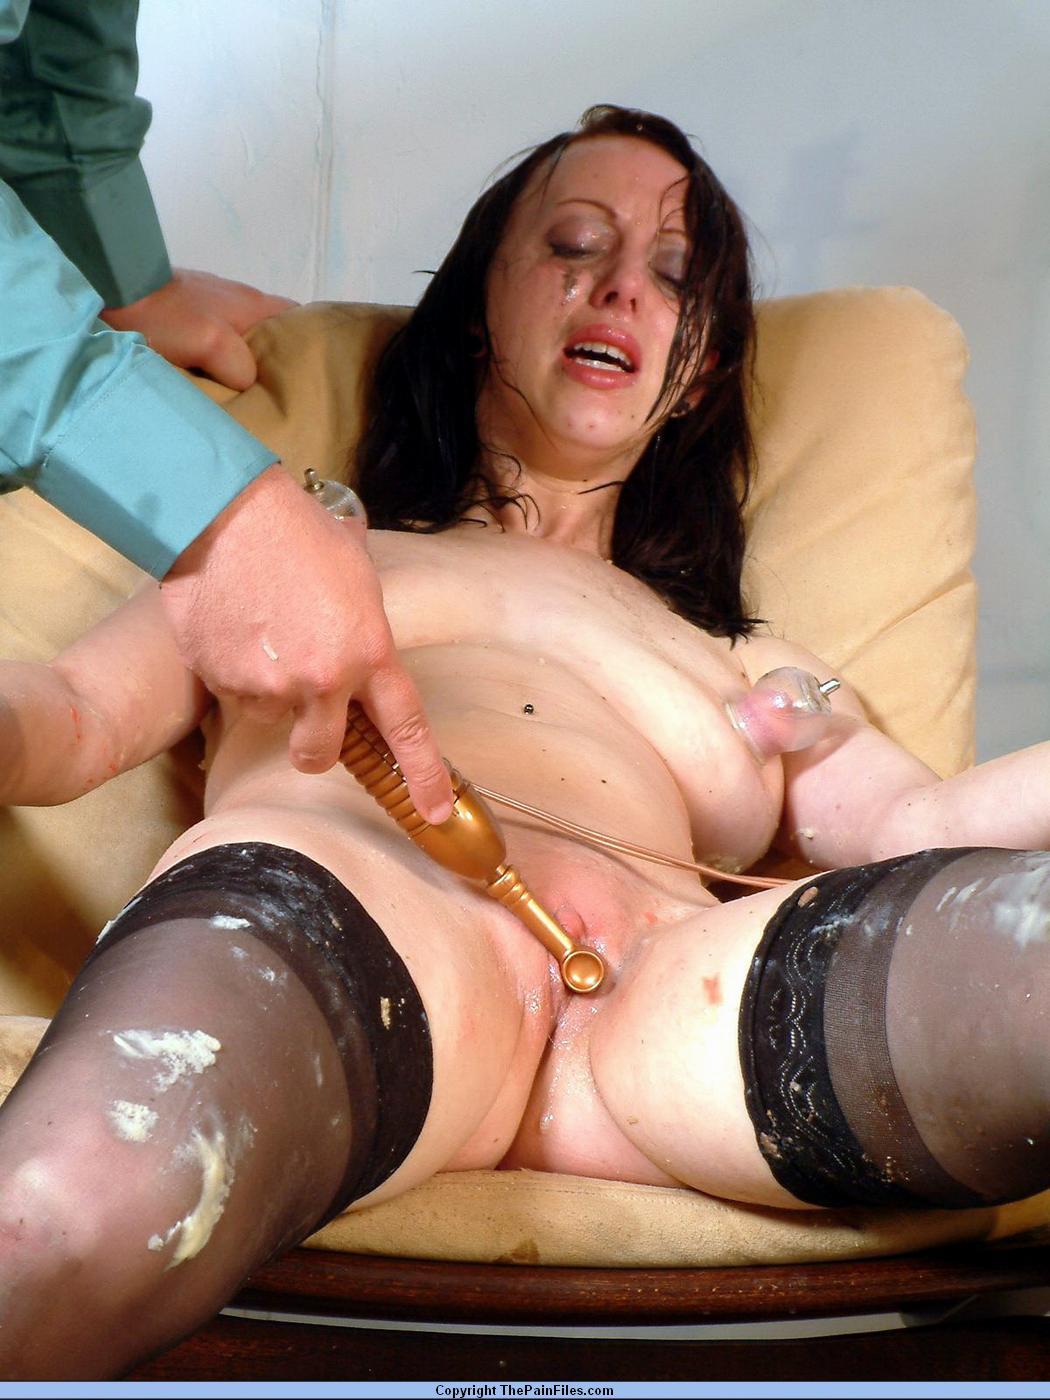 Pics Of Females Porn Extreme Hardcore Adult Comics